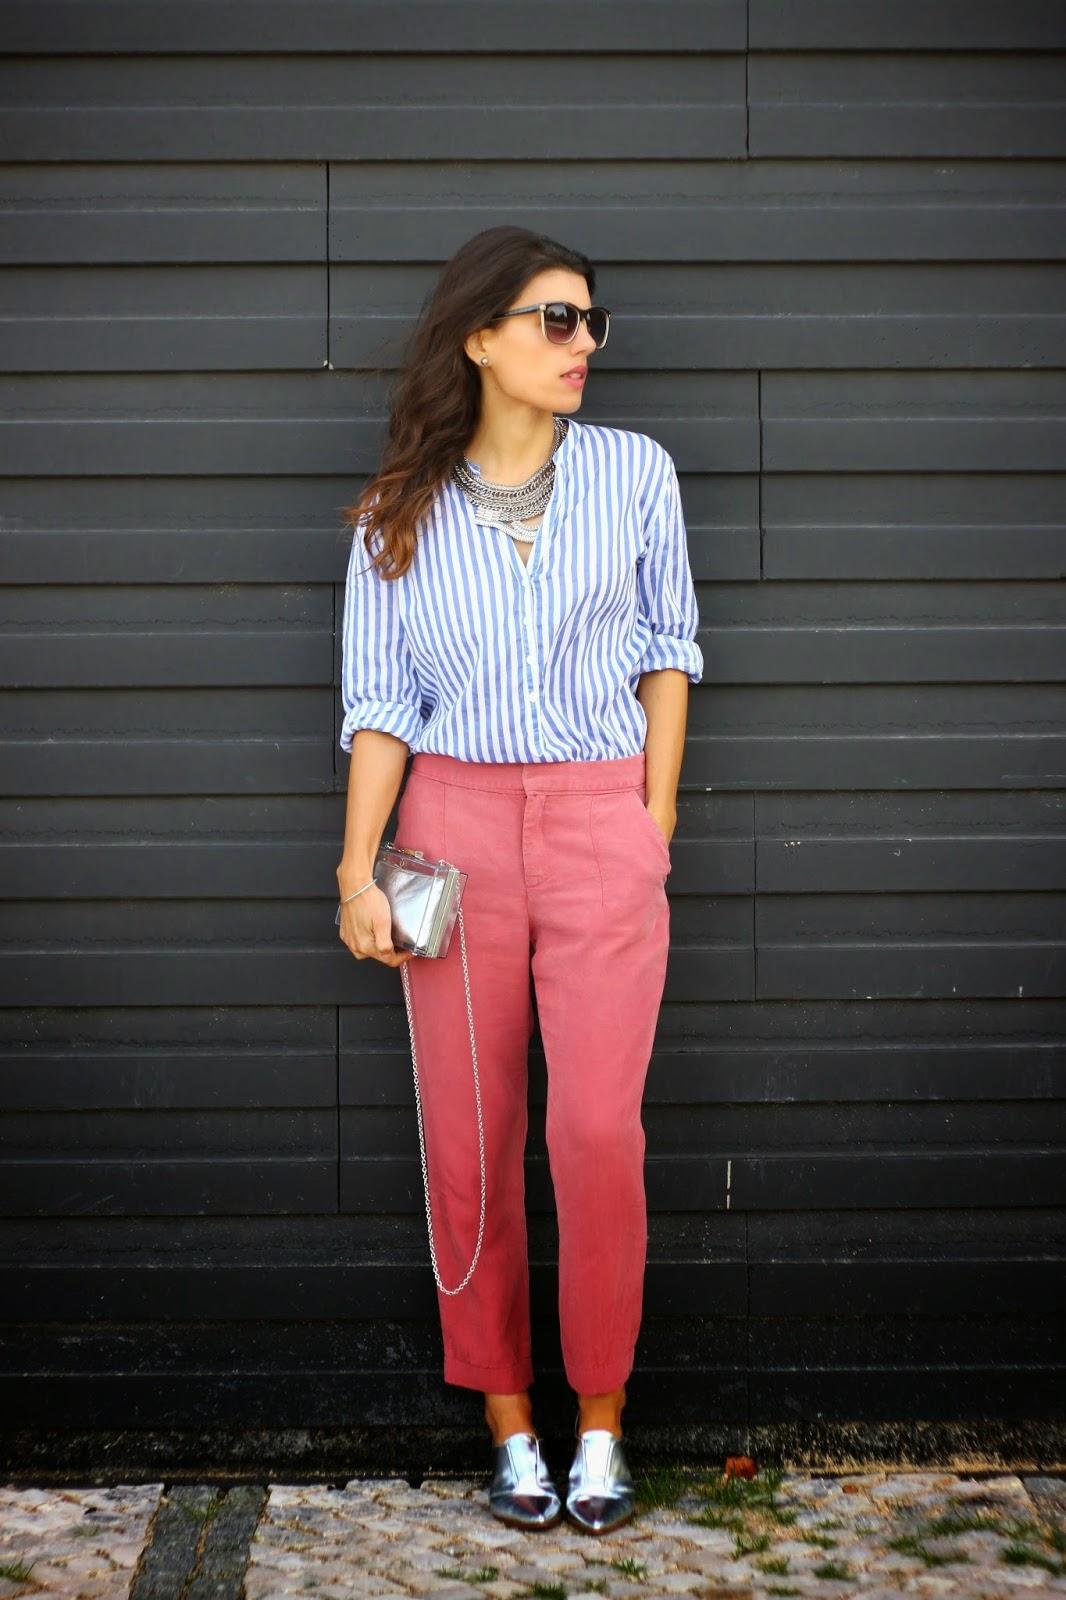 http://ilovefitametrica.blogspot.pt/2014/11/stripes-pink.html#more